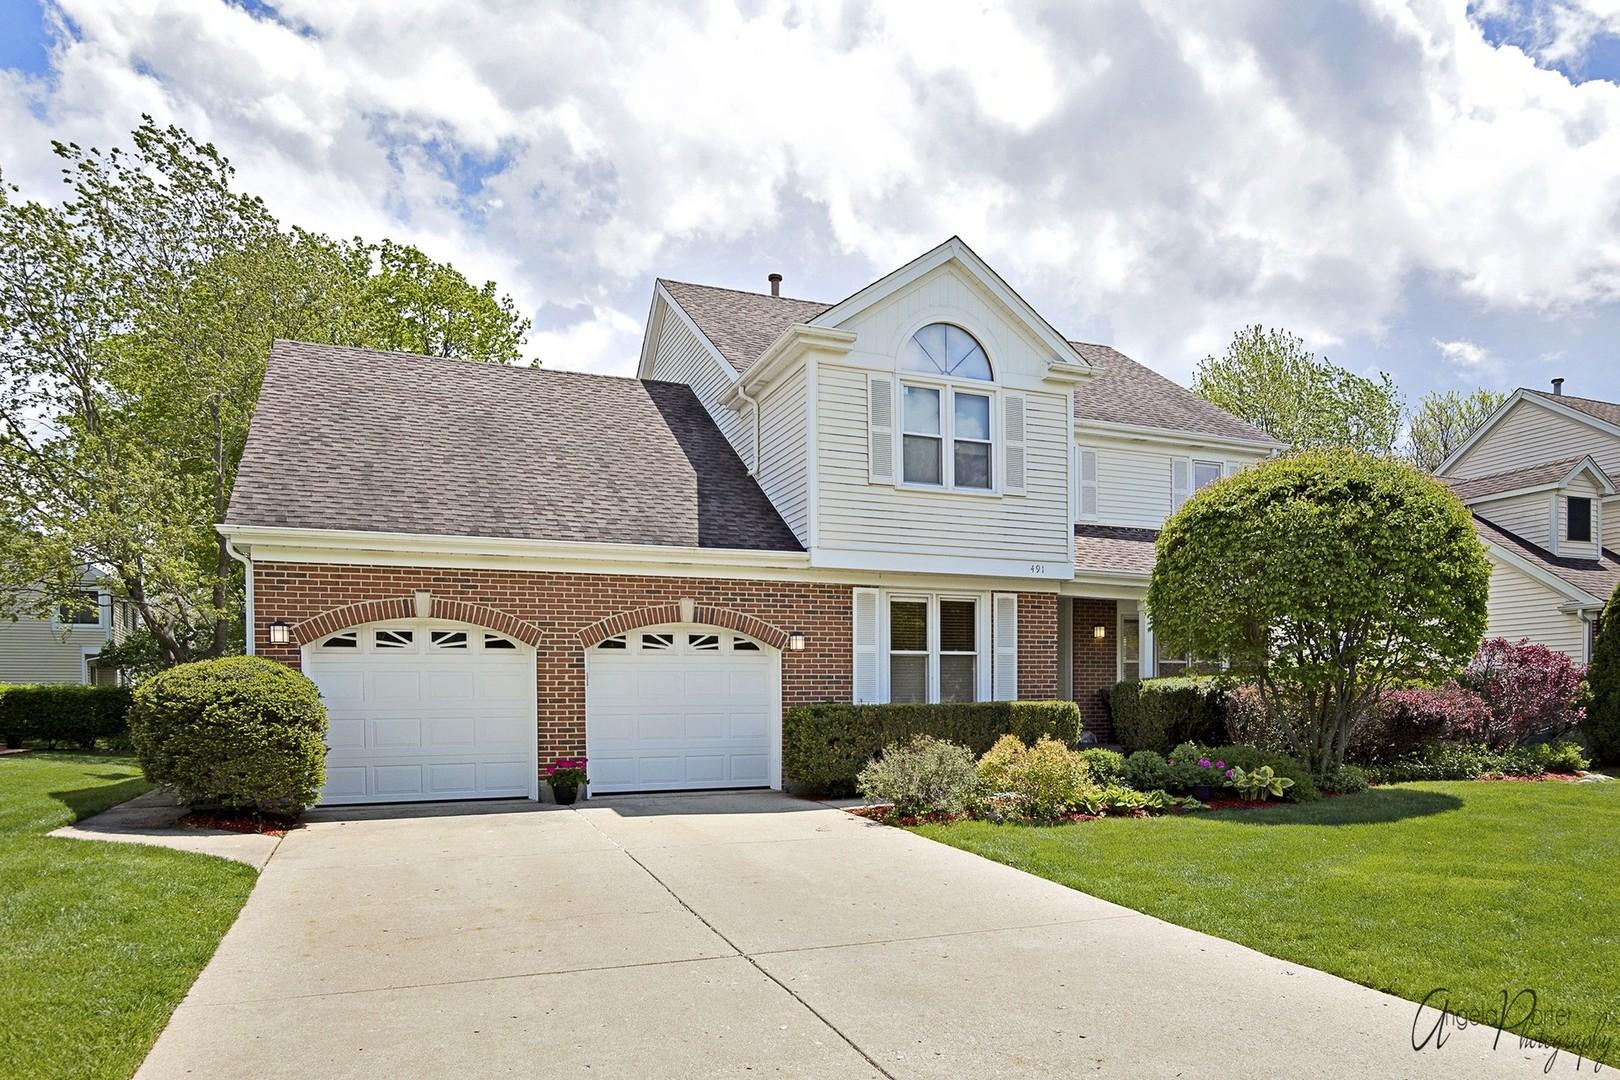 491 Satinwood ,Buffalo Grove, Illinois 60089